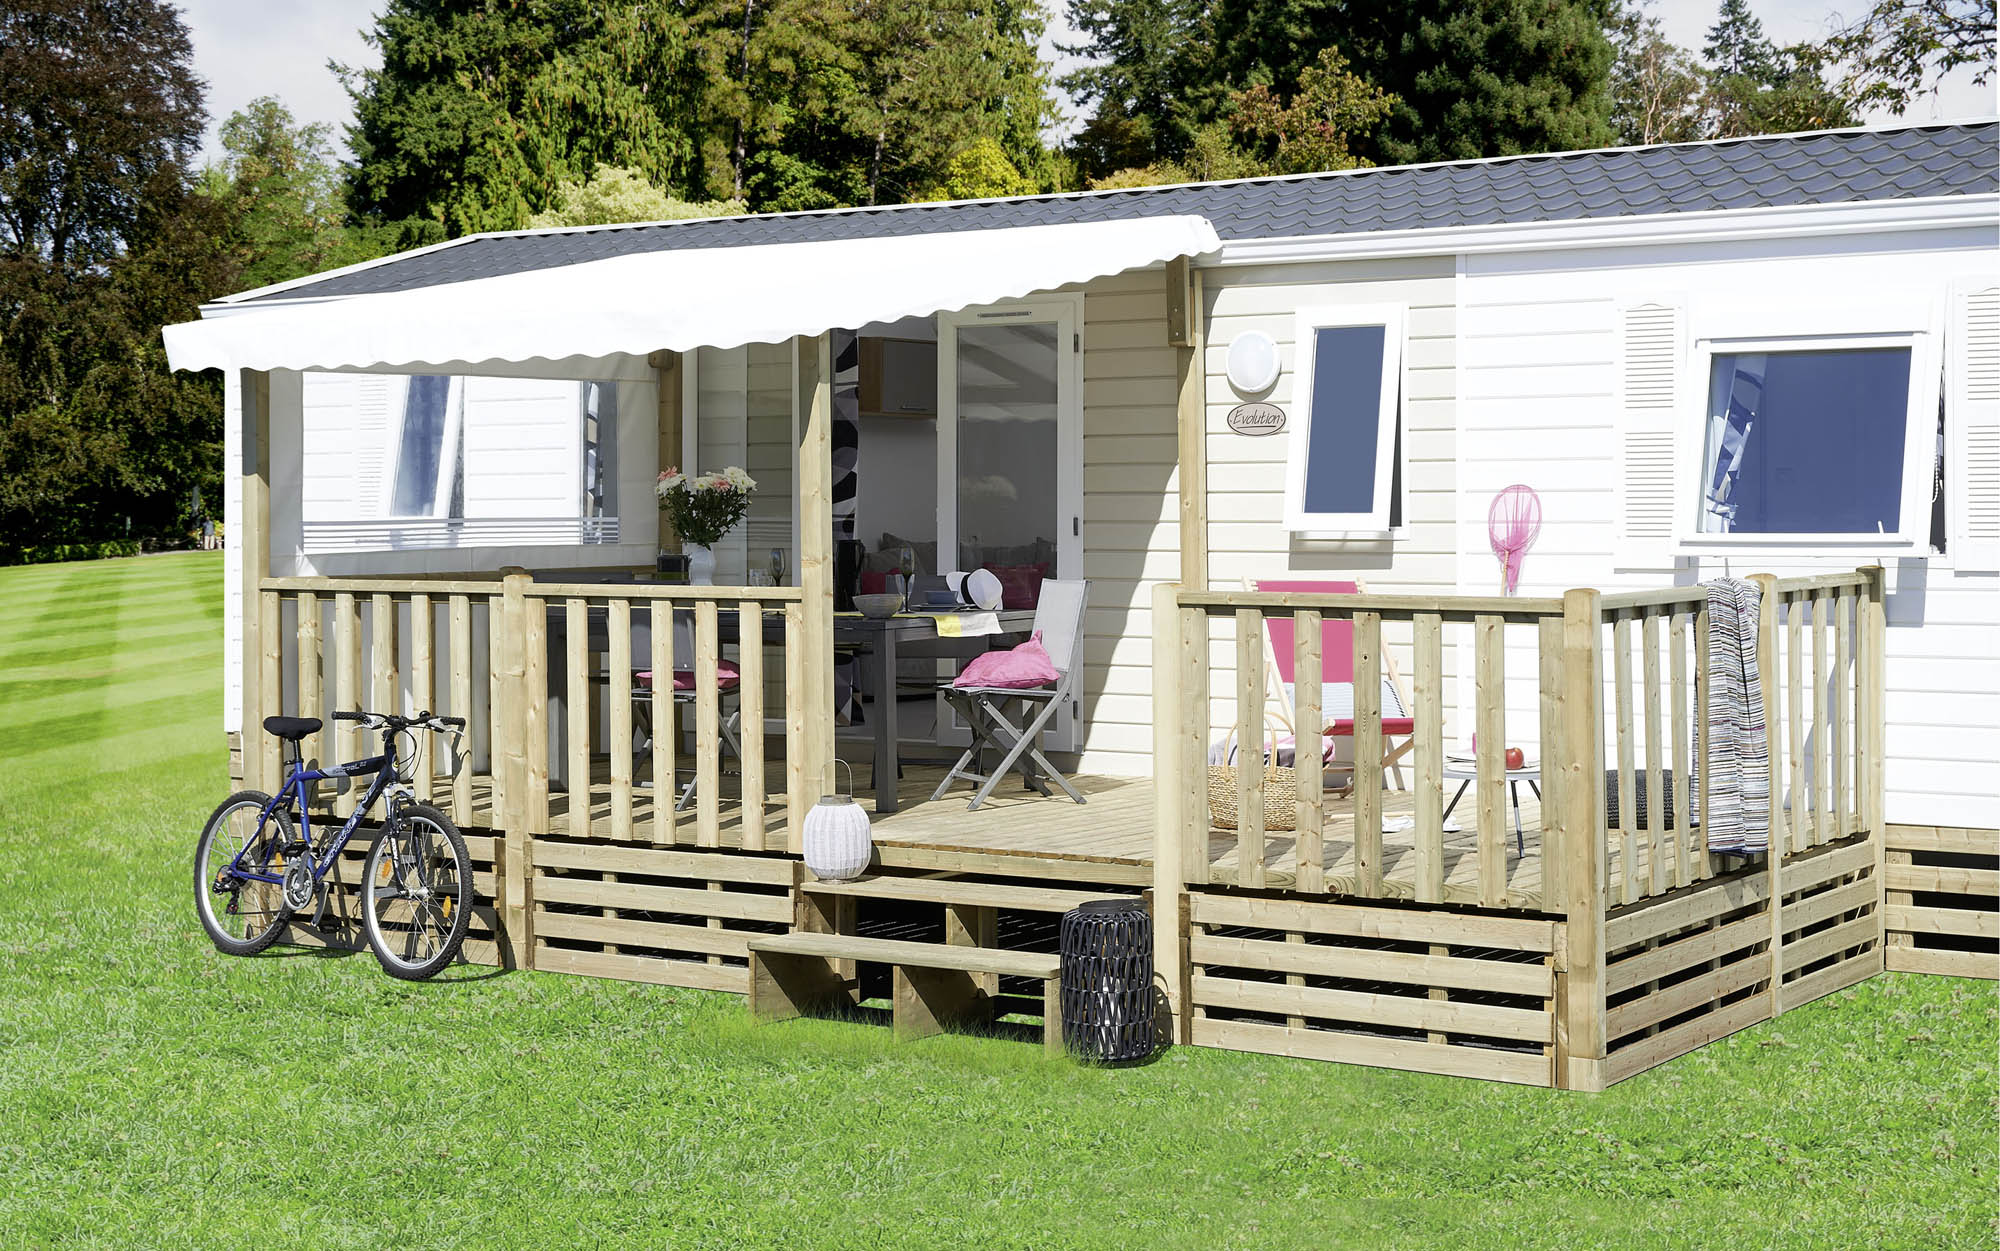 terrasse mobil home couverte semi couverte en bois coverluxe lattes. Black Bedroom Furniture Sets. Home Design Ideas